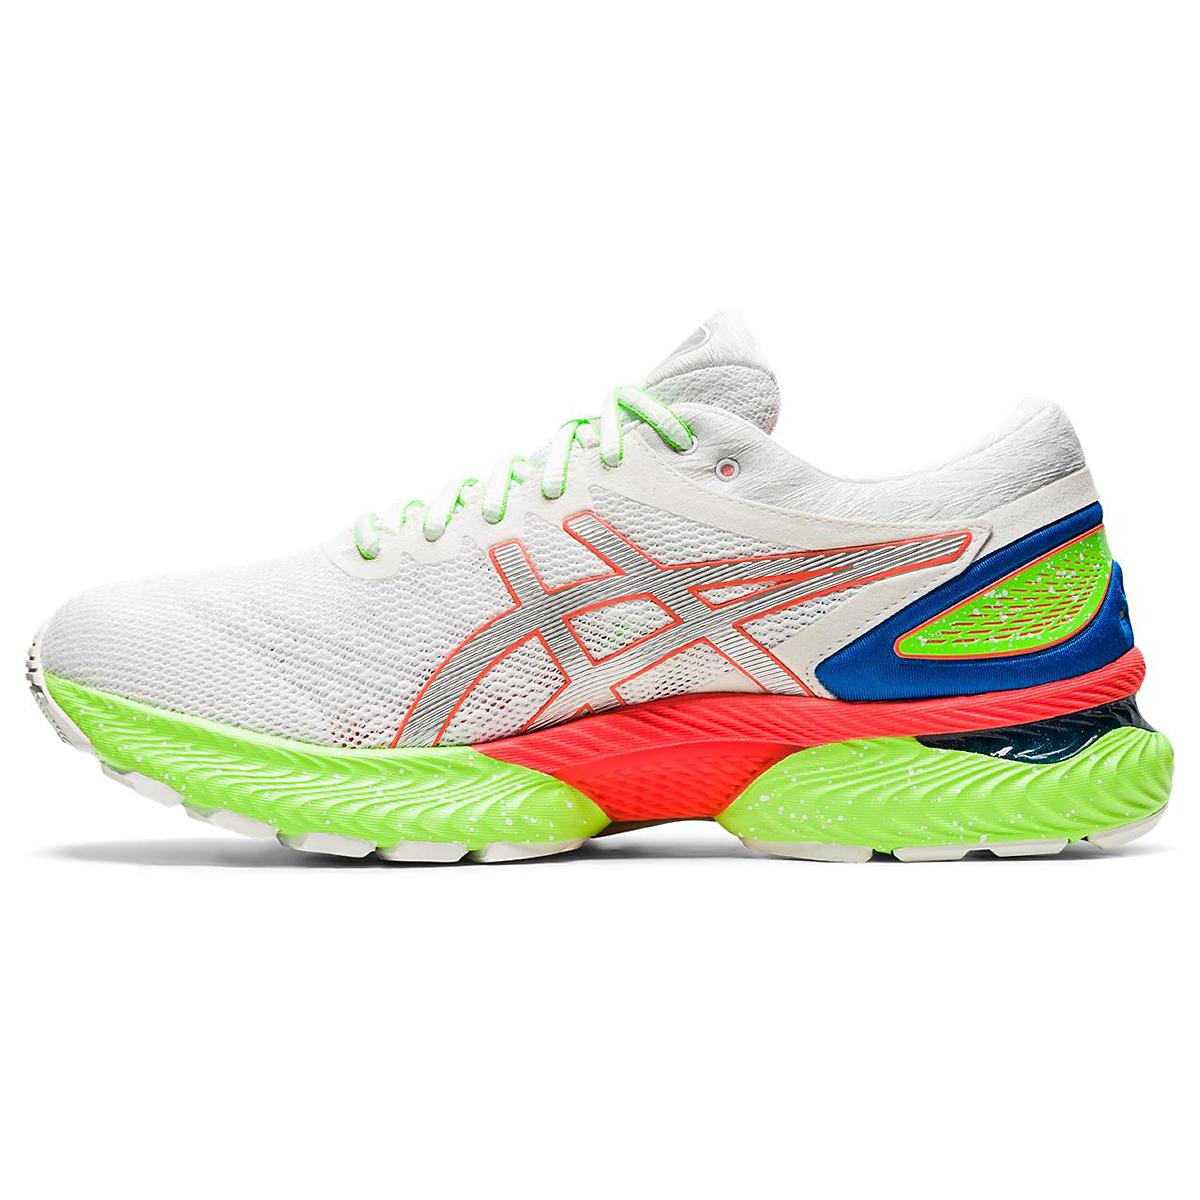 Men's Asics Gel-Nimbus 22 Running Shoe - Color: White/Sunrise Red - Size: 6 - Width: Regular, White/Sunrise Red, large, image 2